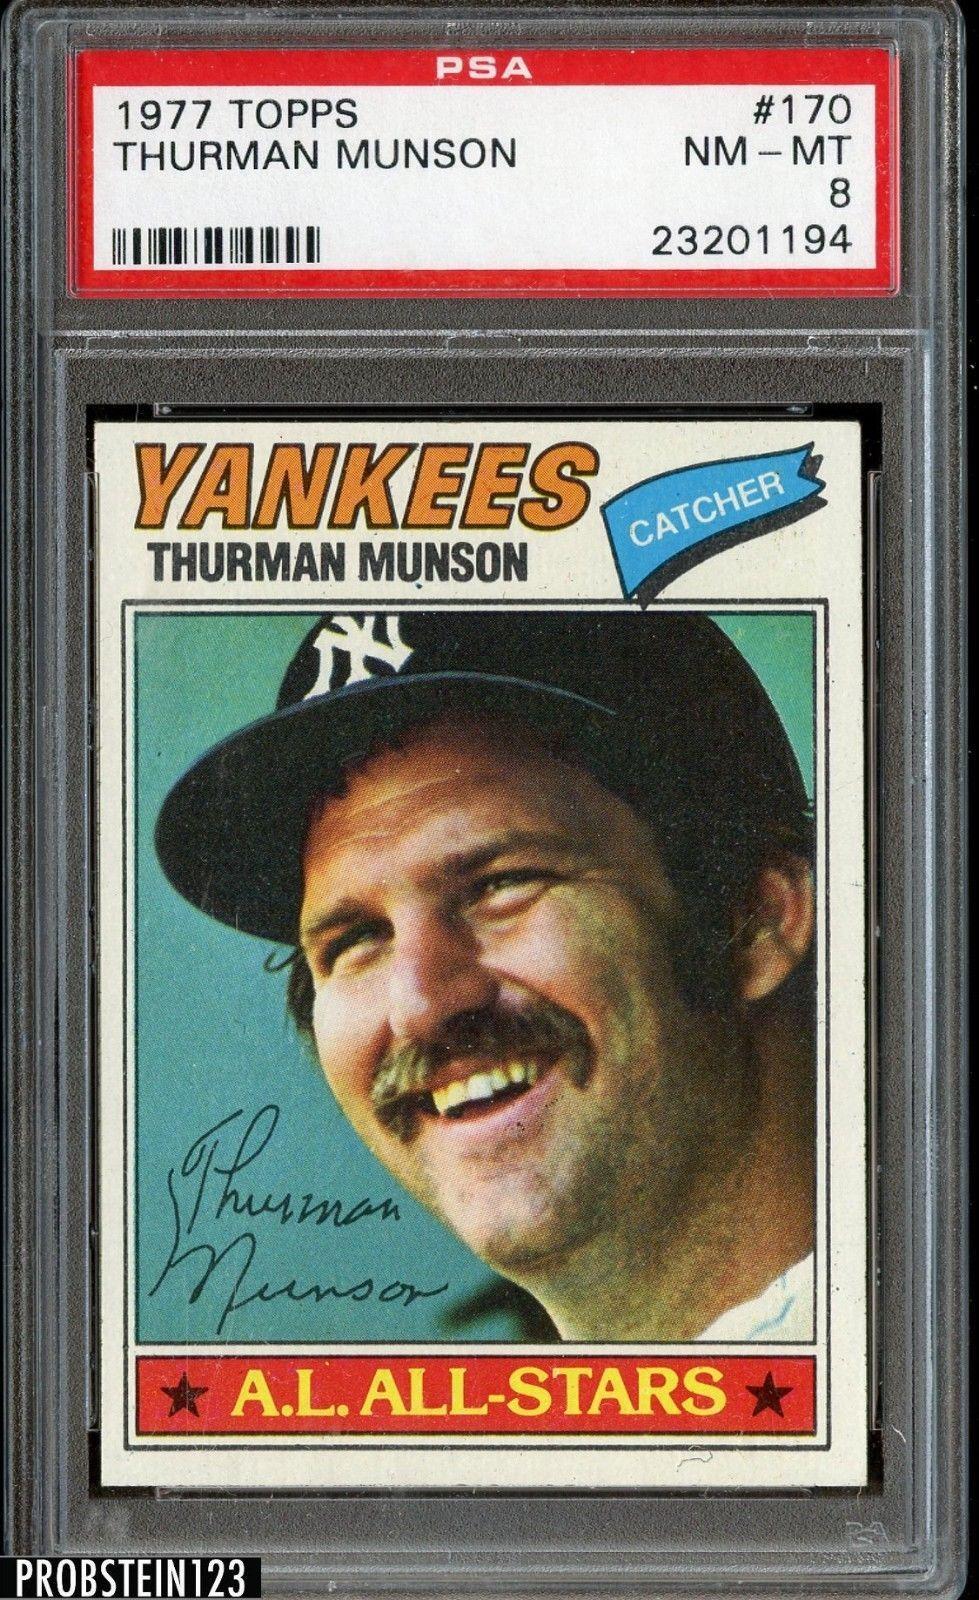 1977 topps 170 thurman munson new york yankees psa 8 nm